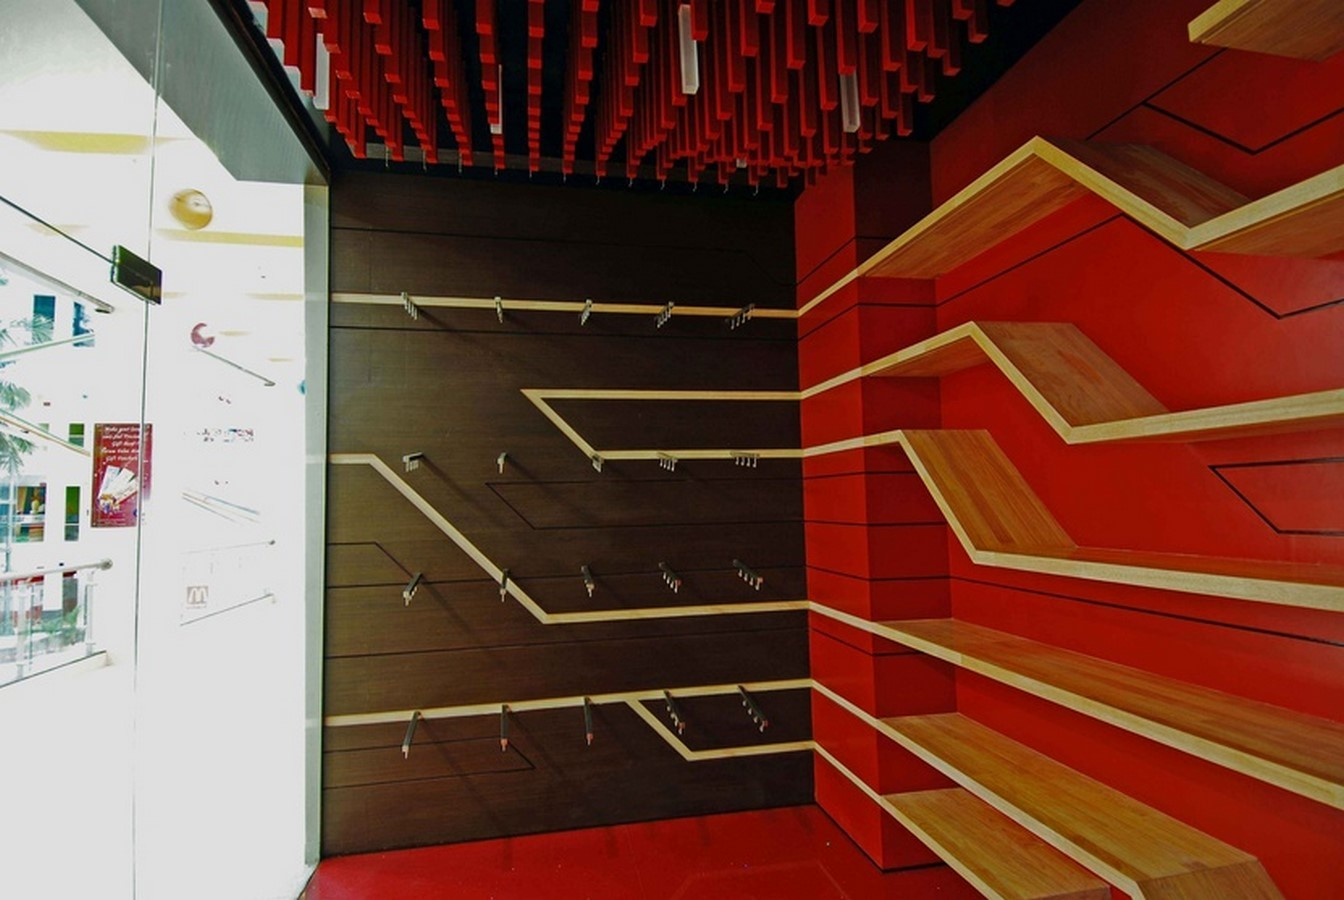 Jute Cottage Retail Interiors - Sheet1